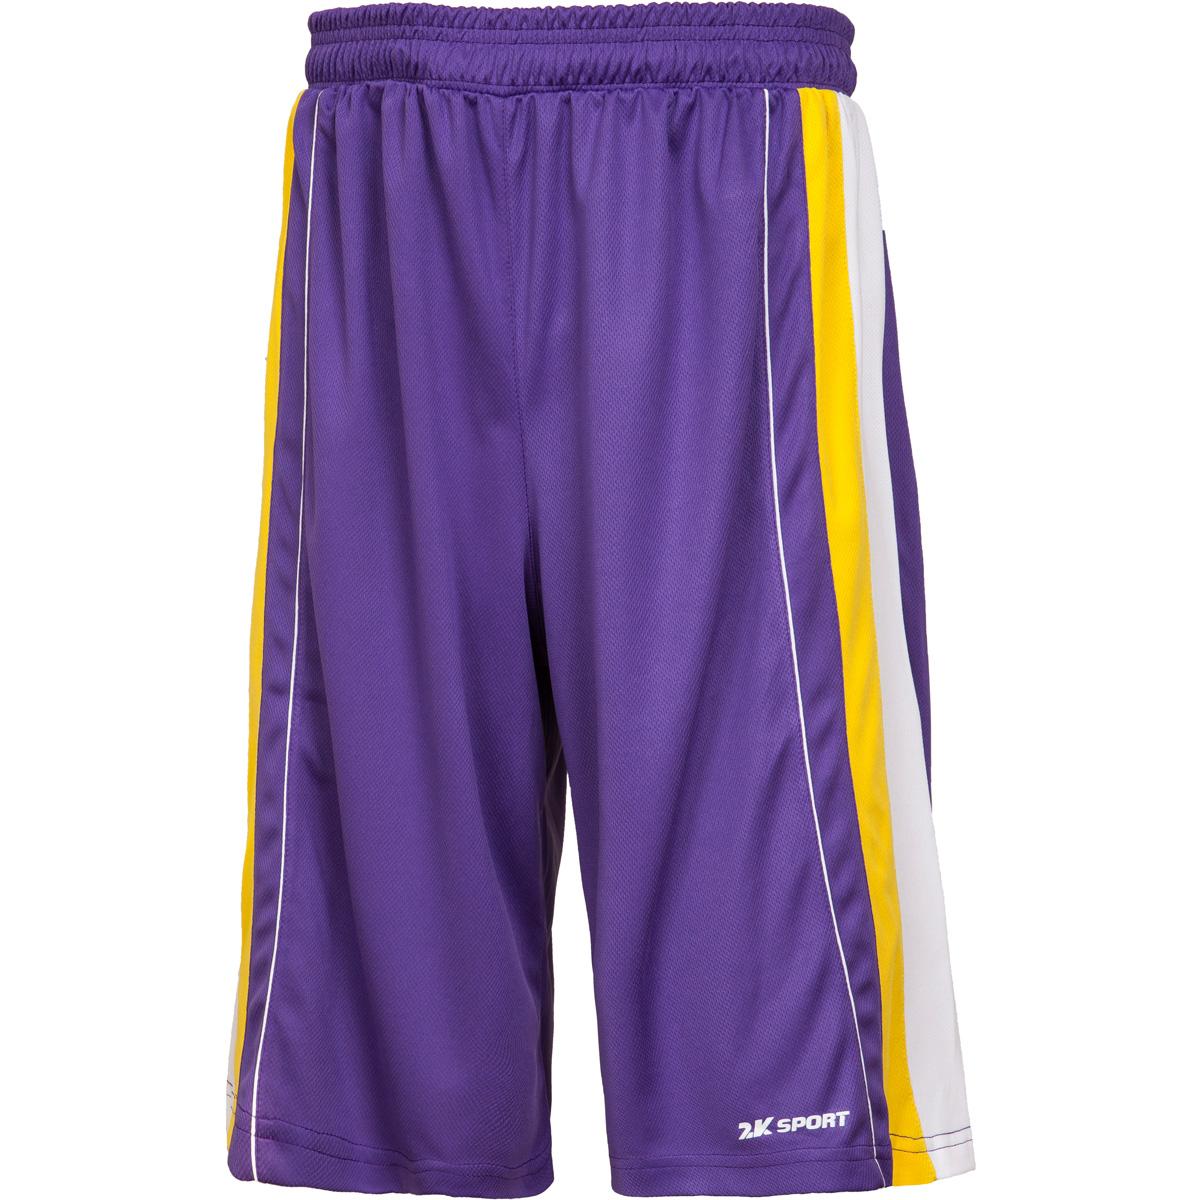 Шорты баскетбольные мужские 2K Sport Advance, цвет: фиолетовый, желтый, белый. 130031. Размер XXL (54) - Баскетбол